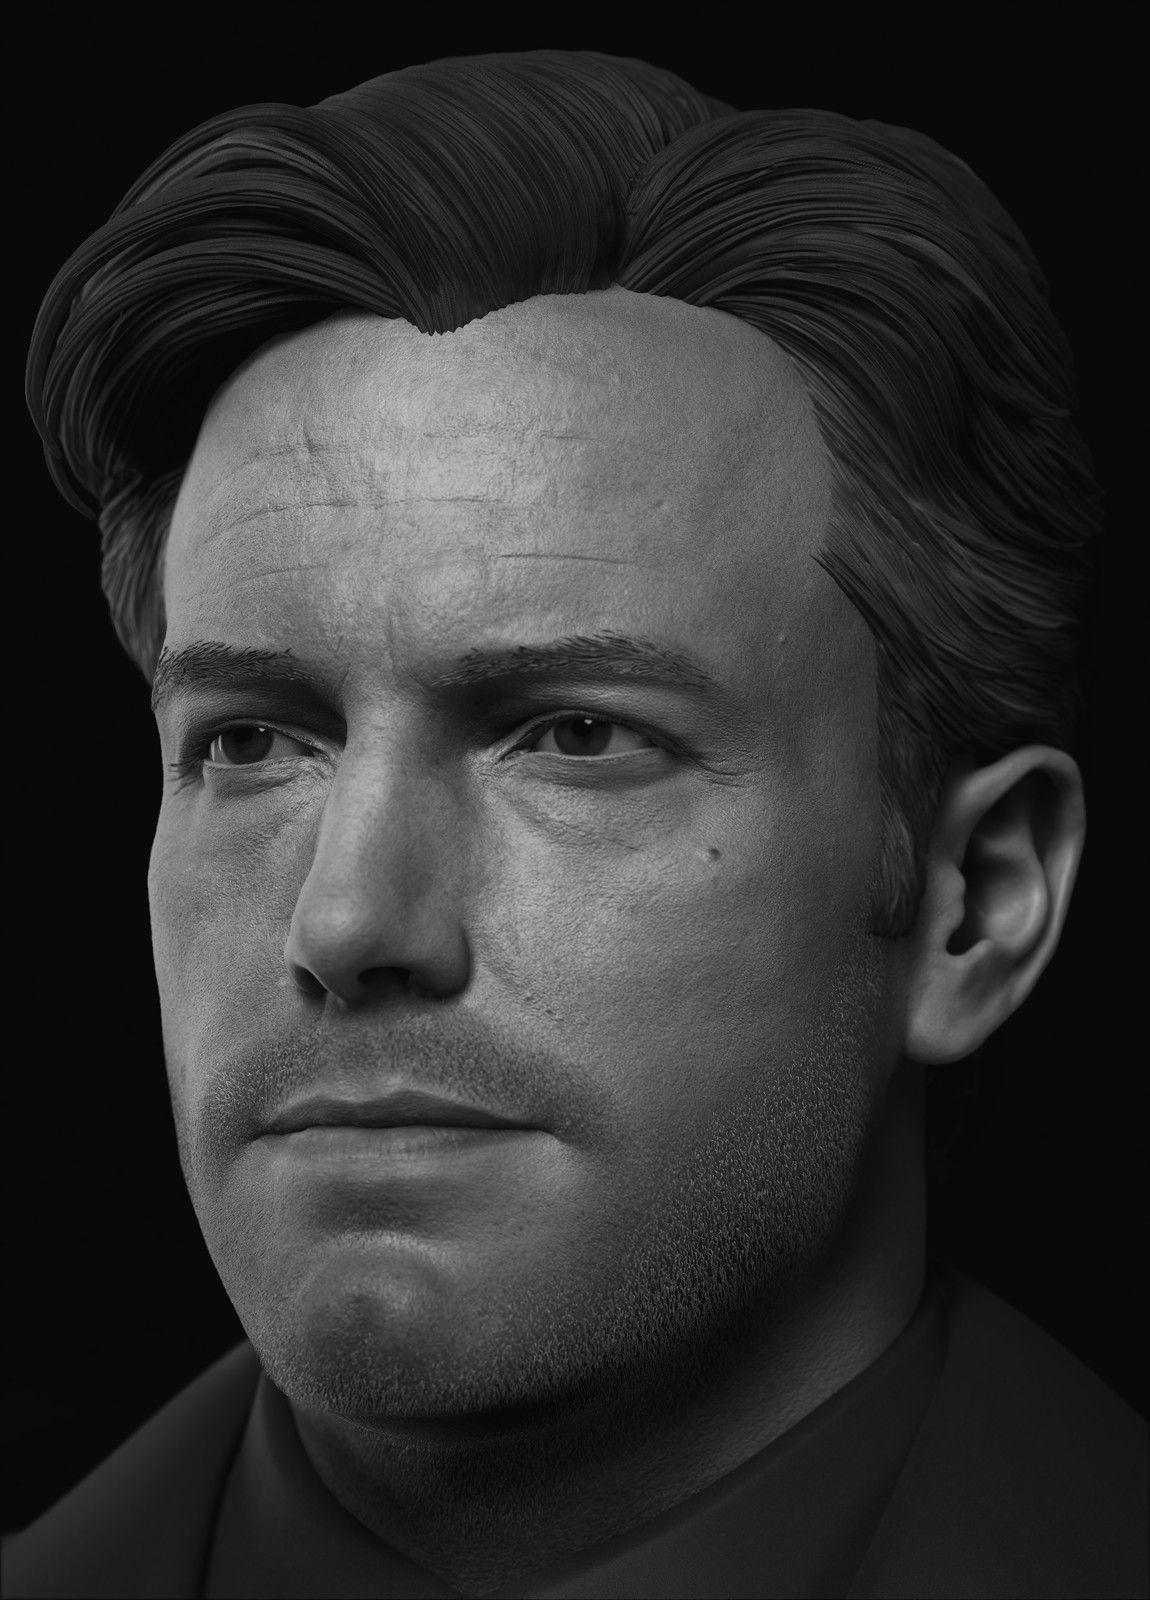 Ben Affleck Vimal Kerketta On Artstation At Https Www Artstation Com Artwork Qa083 Ben Affleck Batman Superman Dc Comics Zbrush Likeness